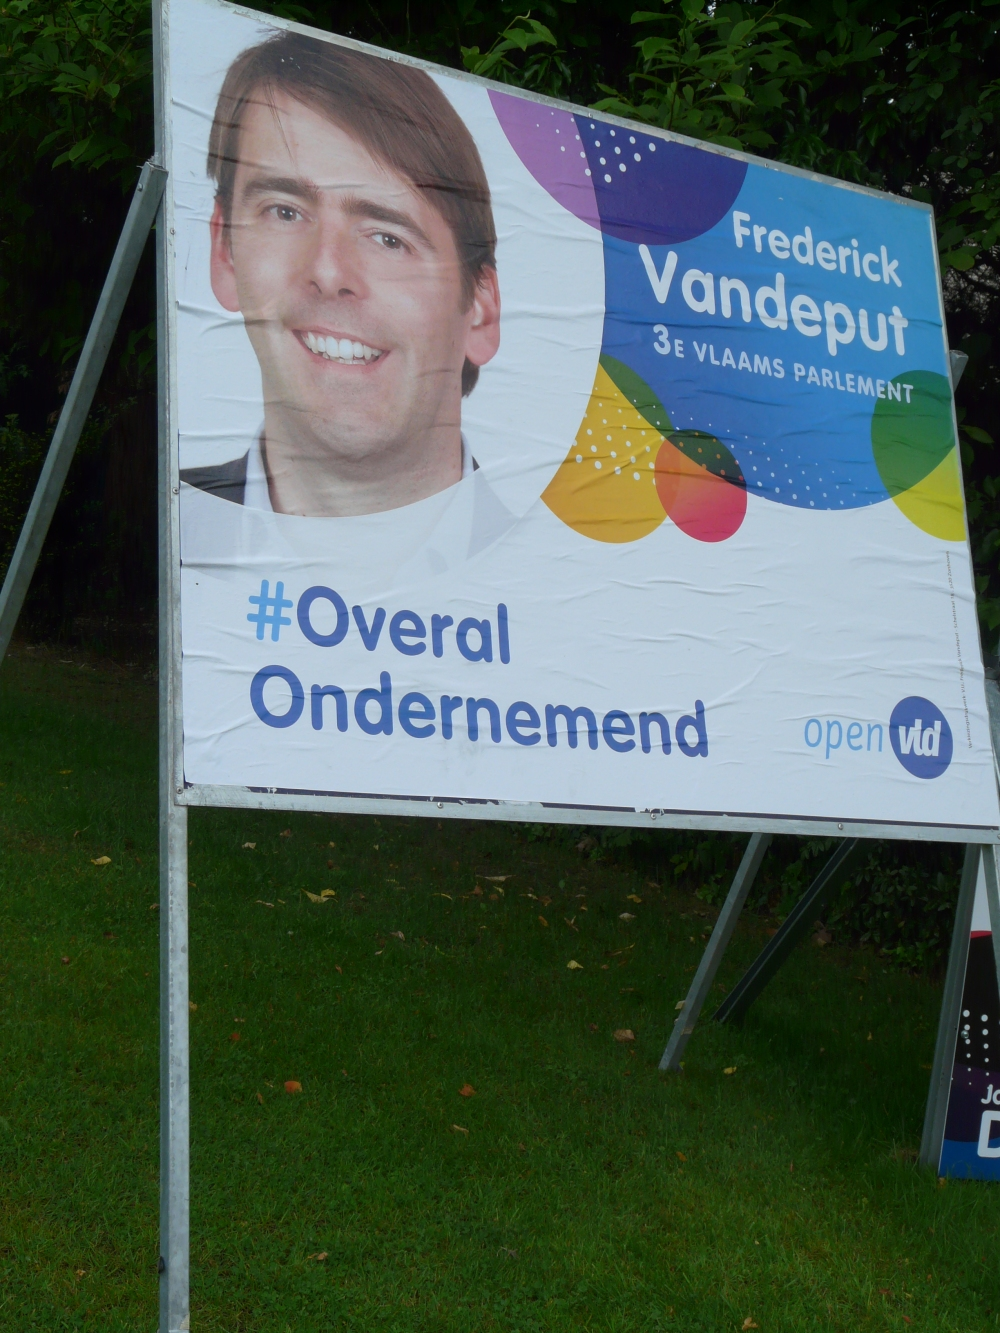 Frederick Vandeput